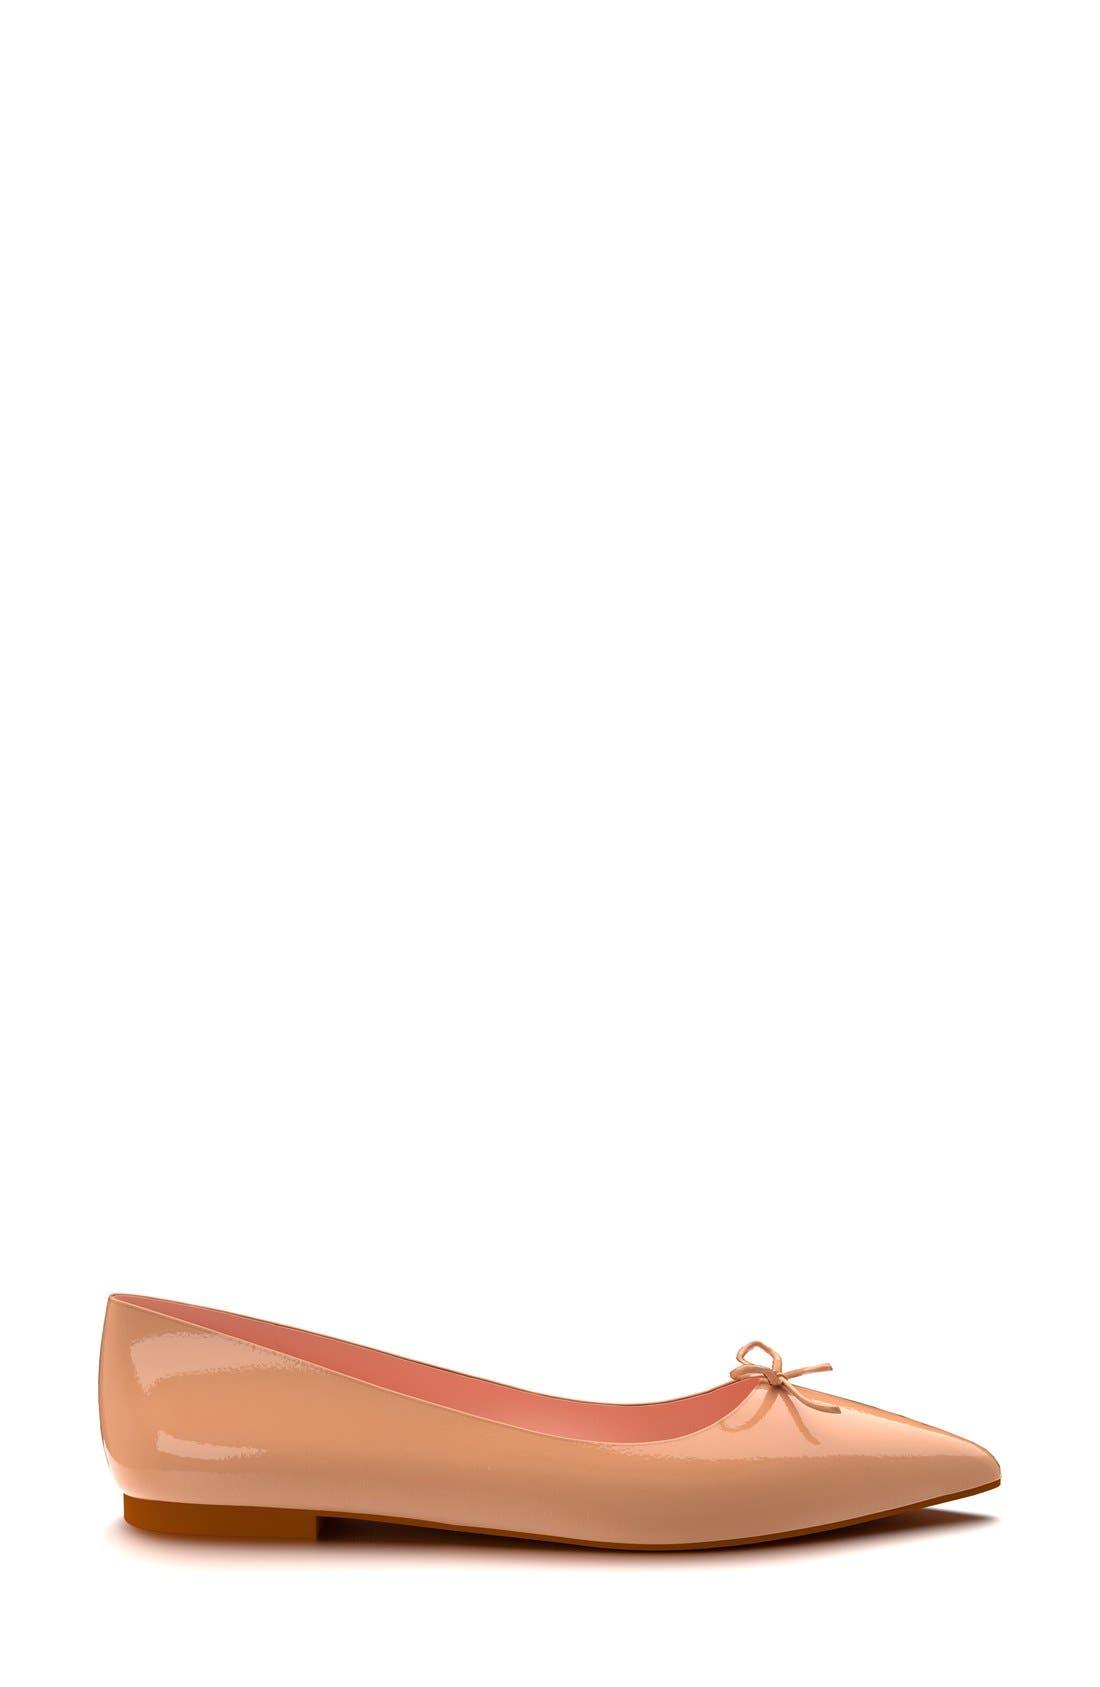 Alternate Image 3  - Shoes of Prey Pointy Toe Ballet Flat (Women)